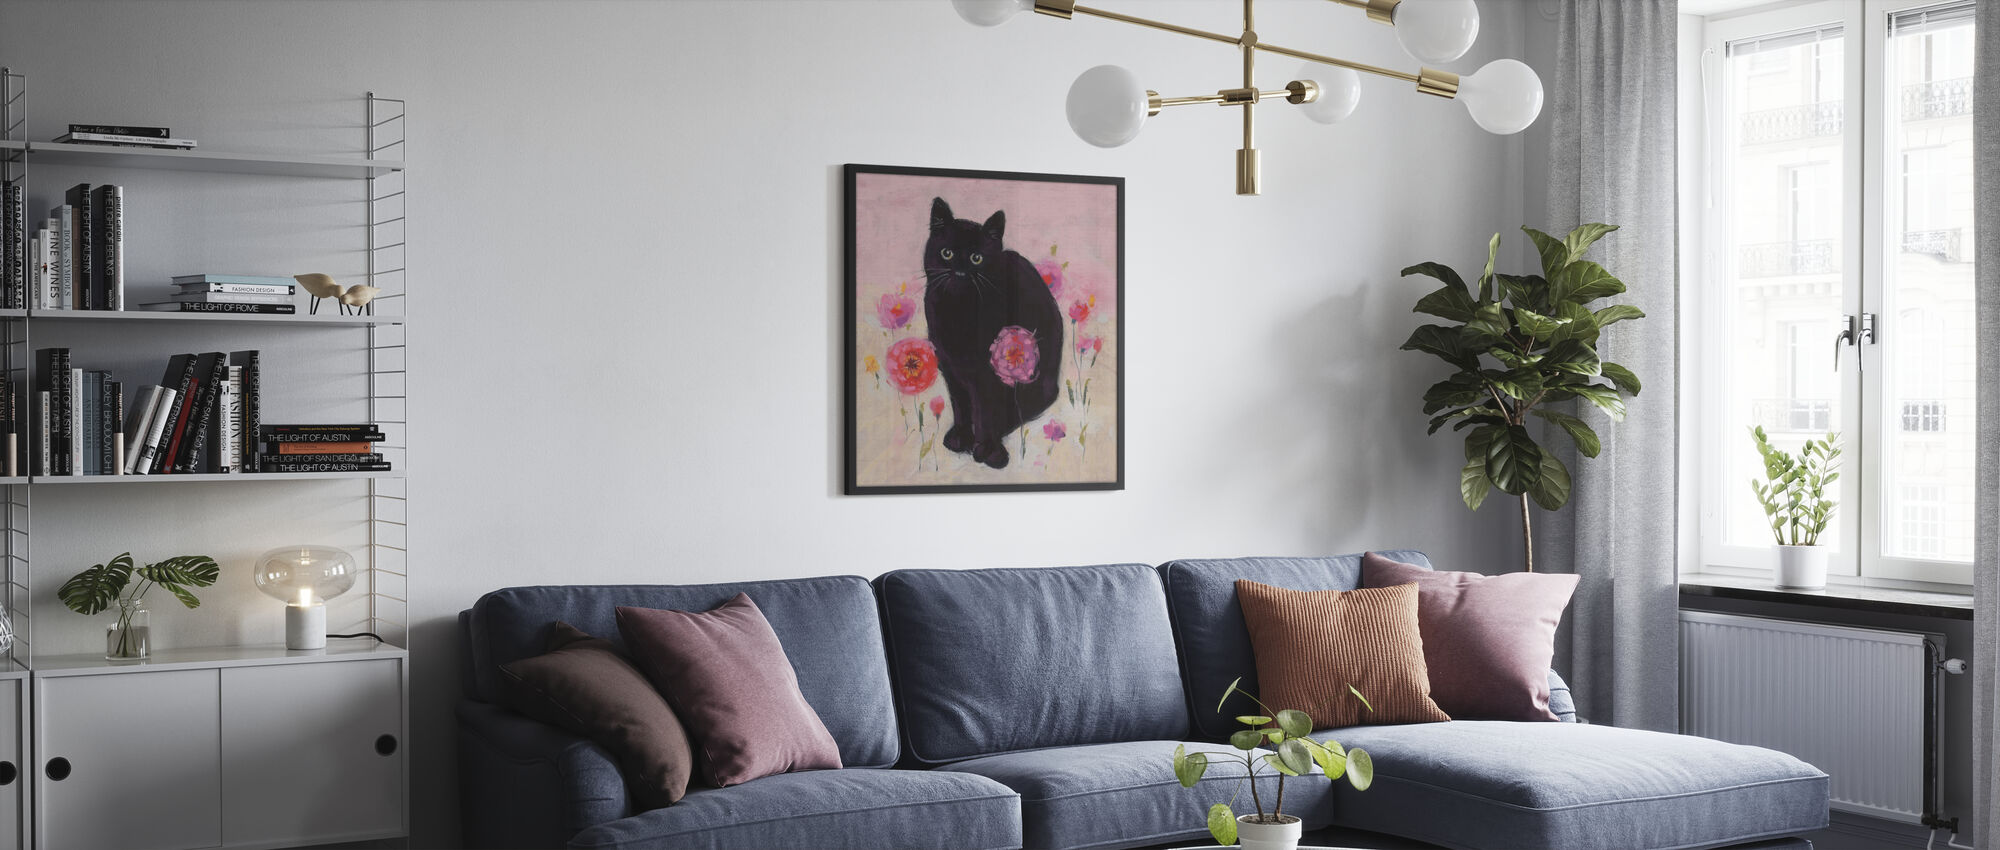 Nina the Cat 02 - Poster - Living Room